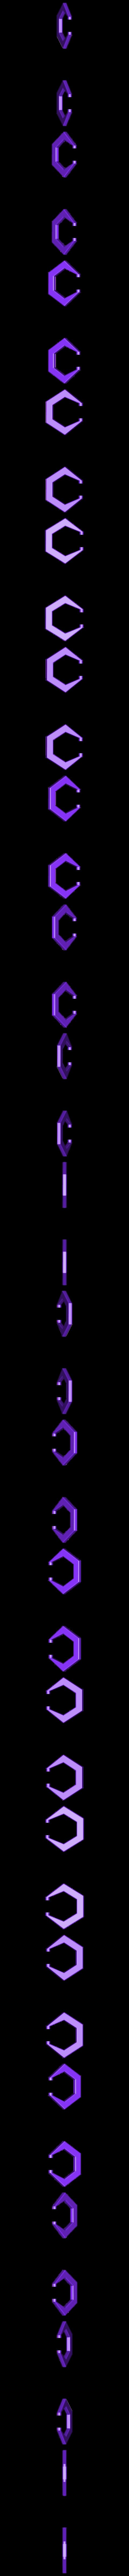 handles.stl Download free STL file Fortnite Chest  • 3D print template, blecheimer